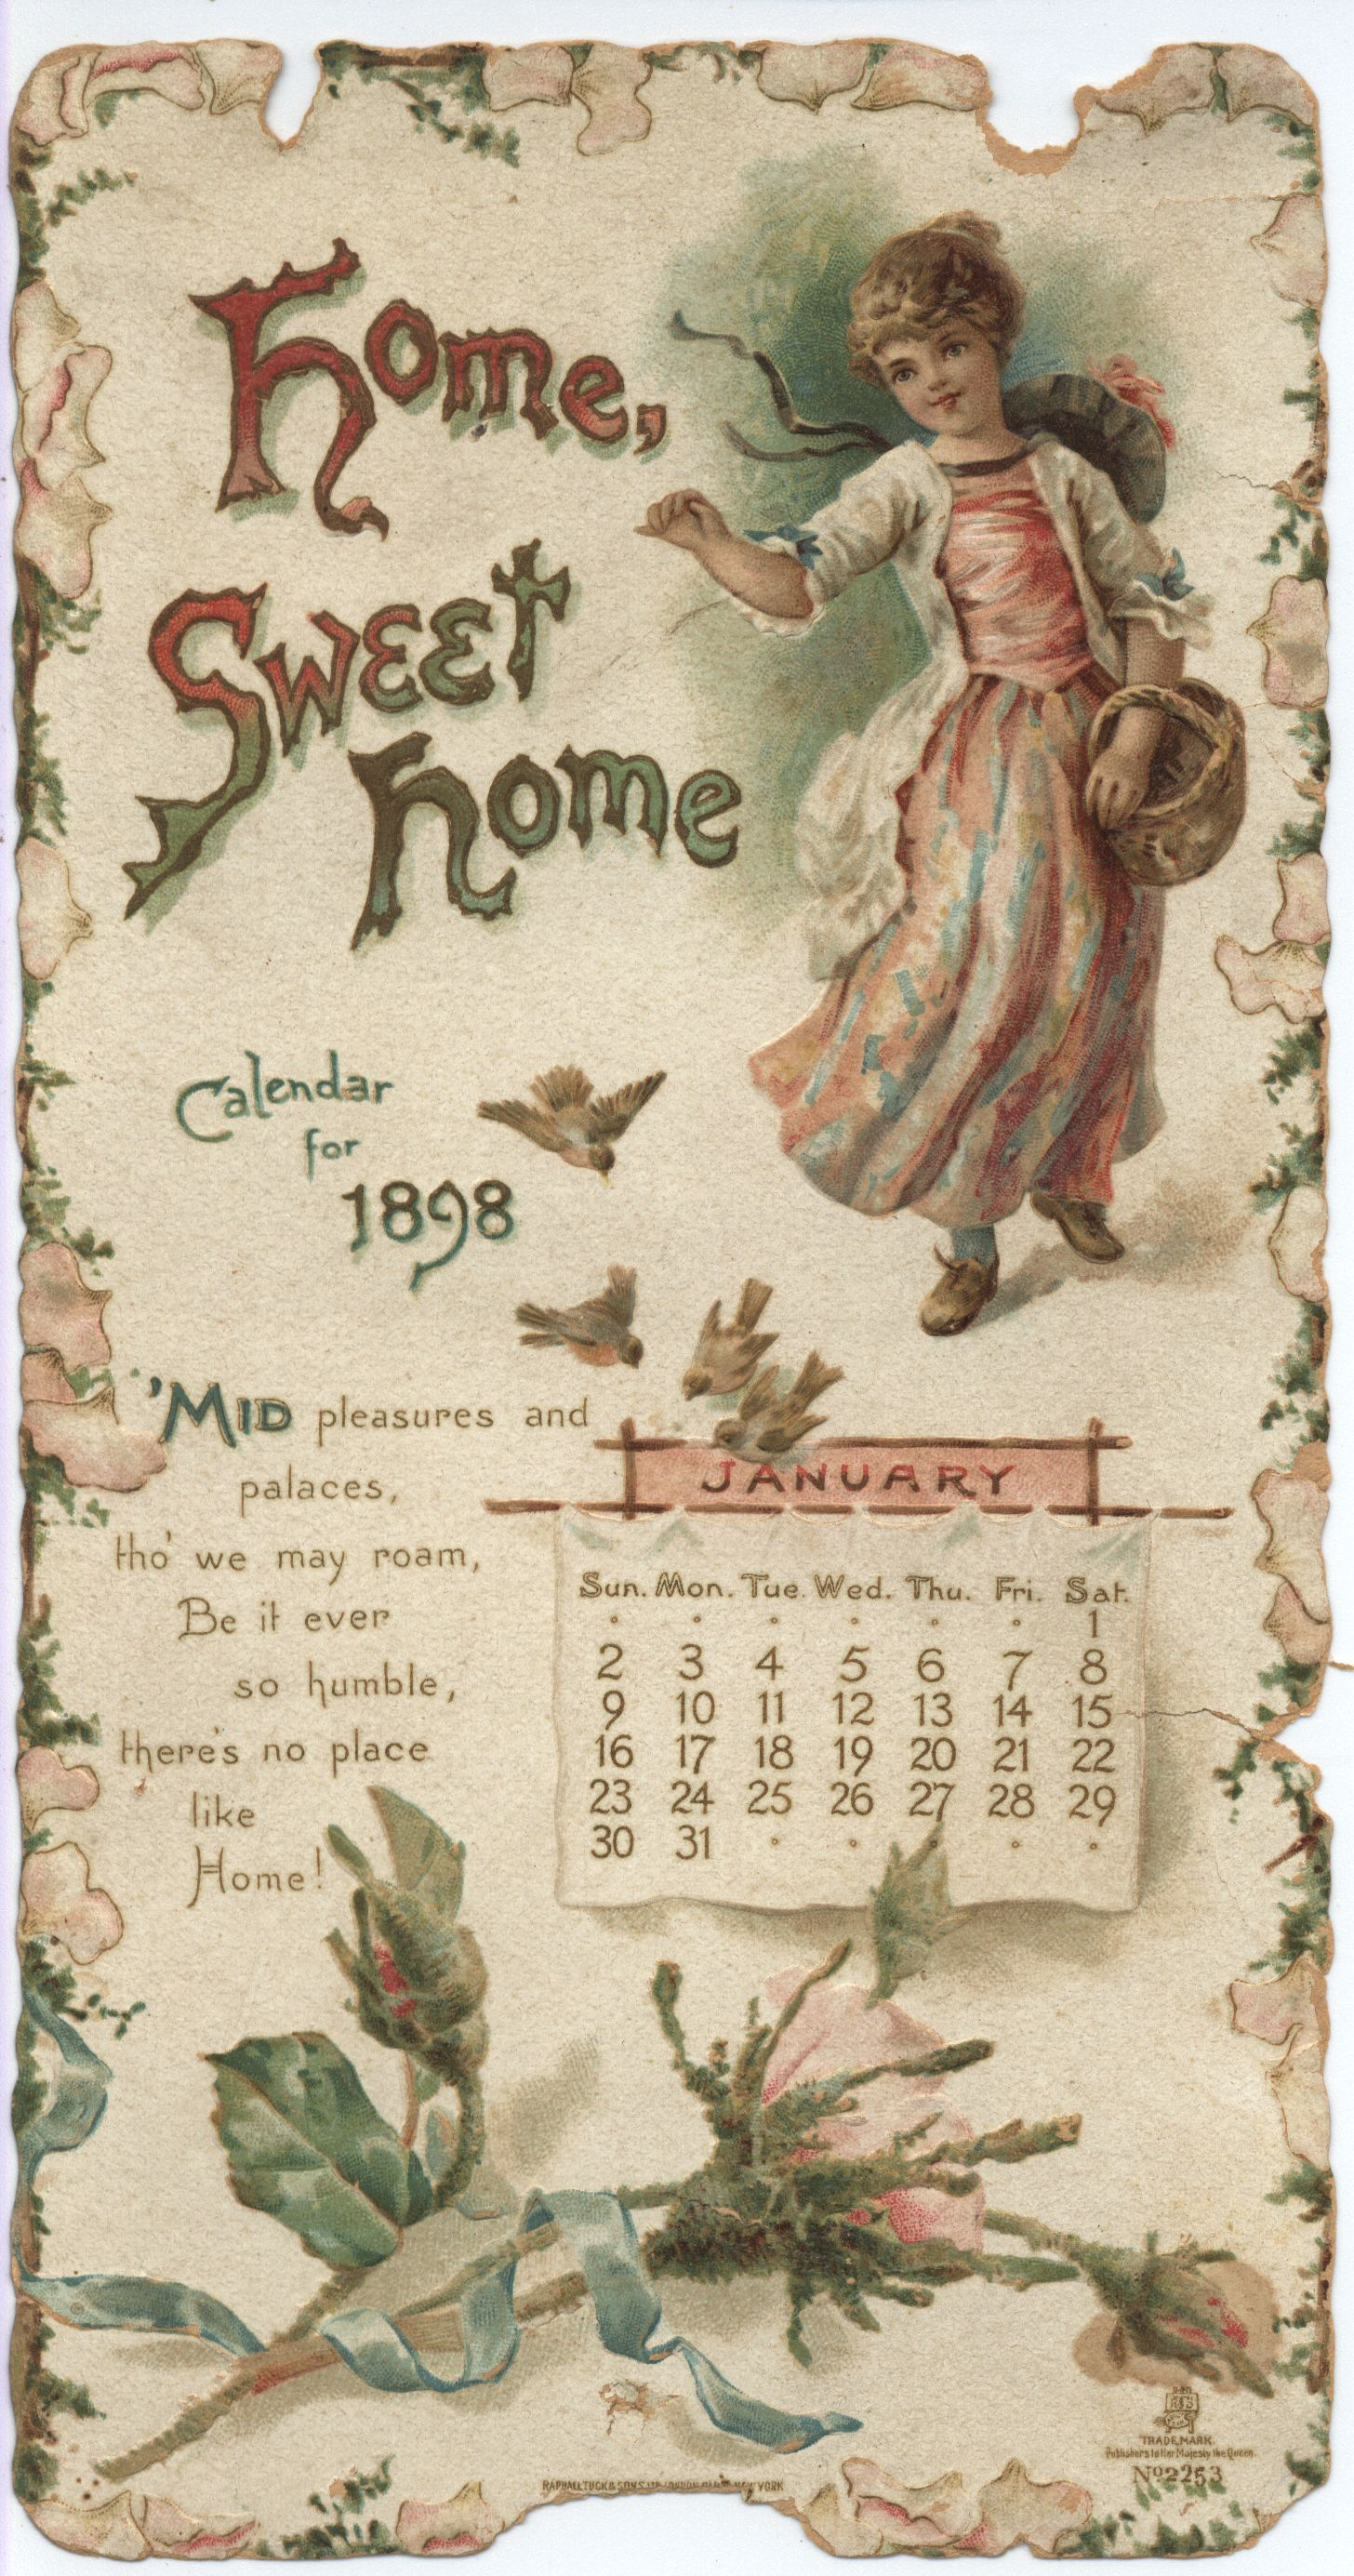 Home Sweet Home Calendar For 1898 Tuckdb Ephemera